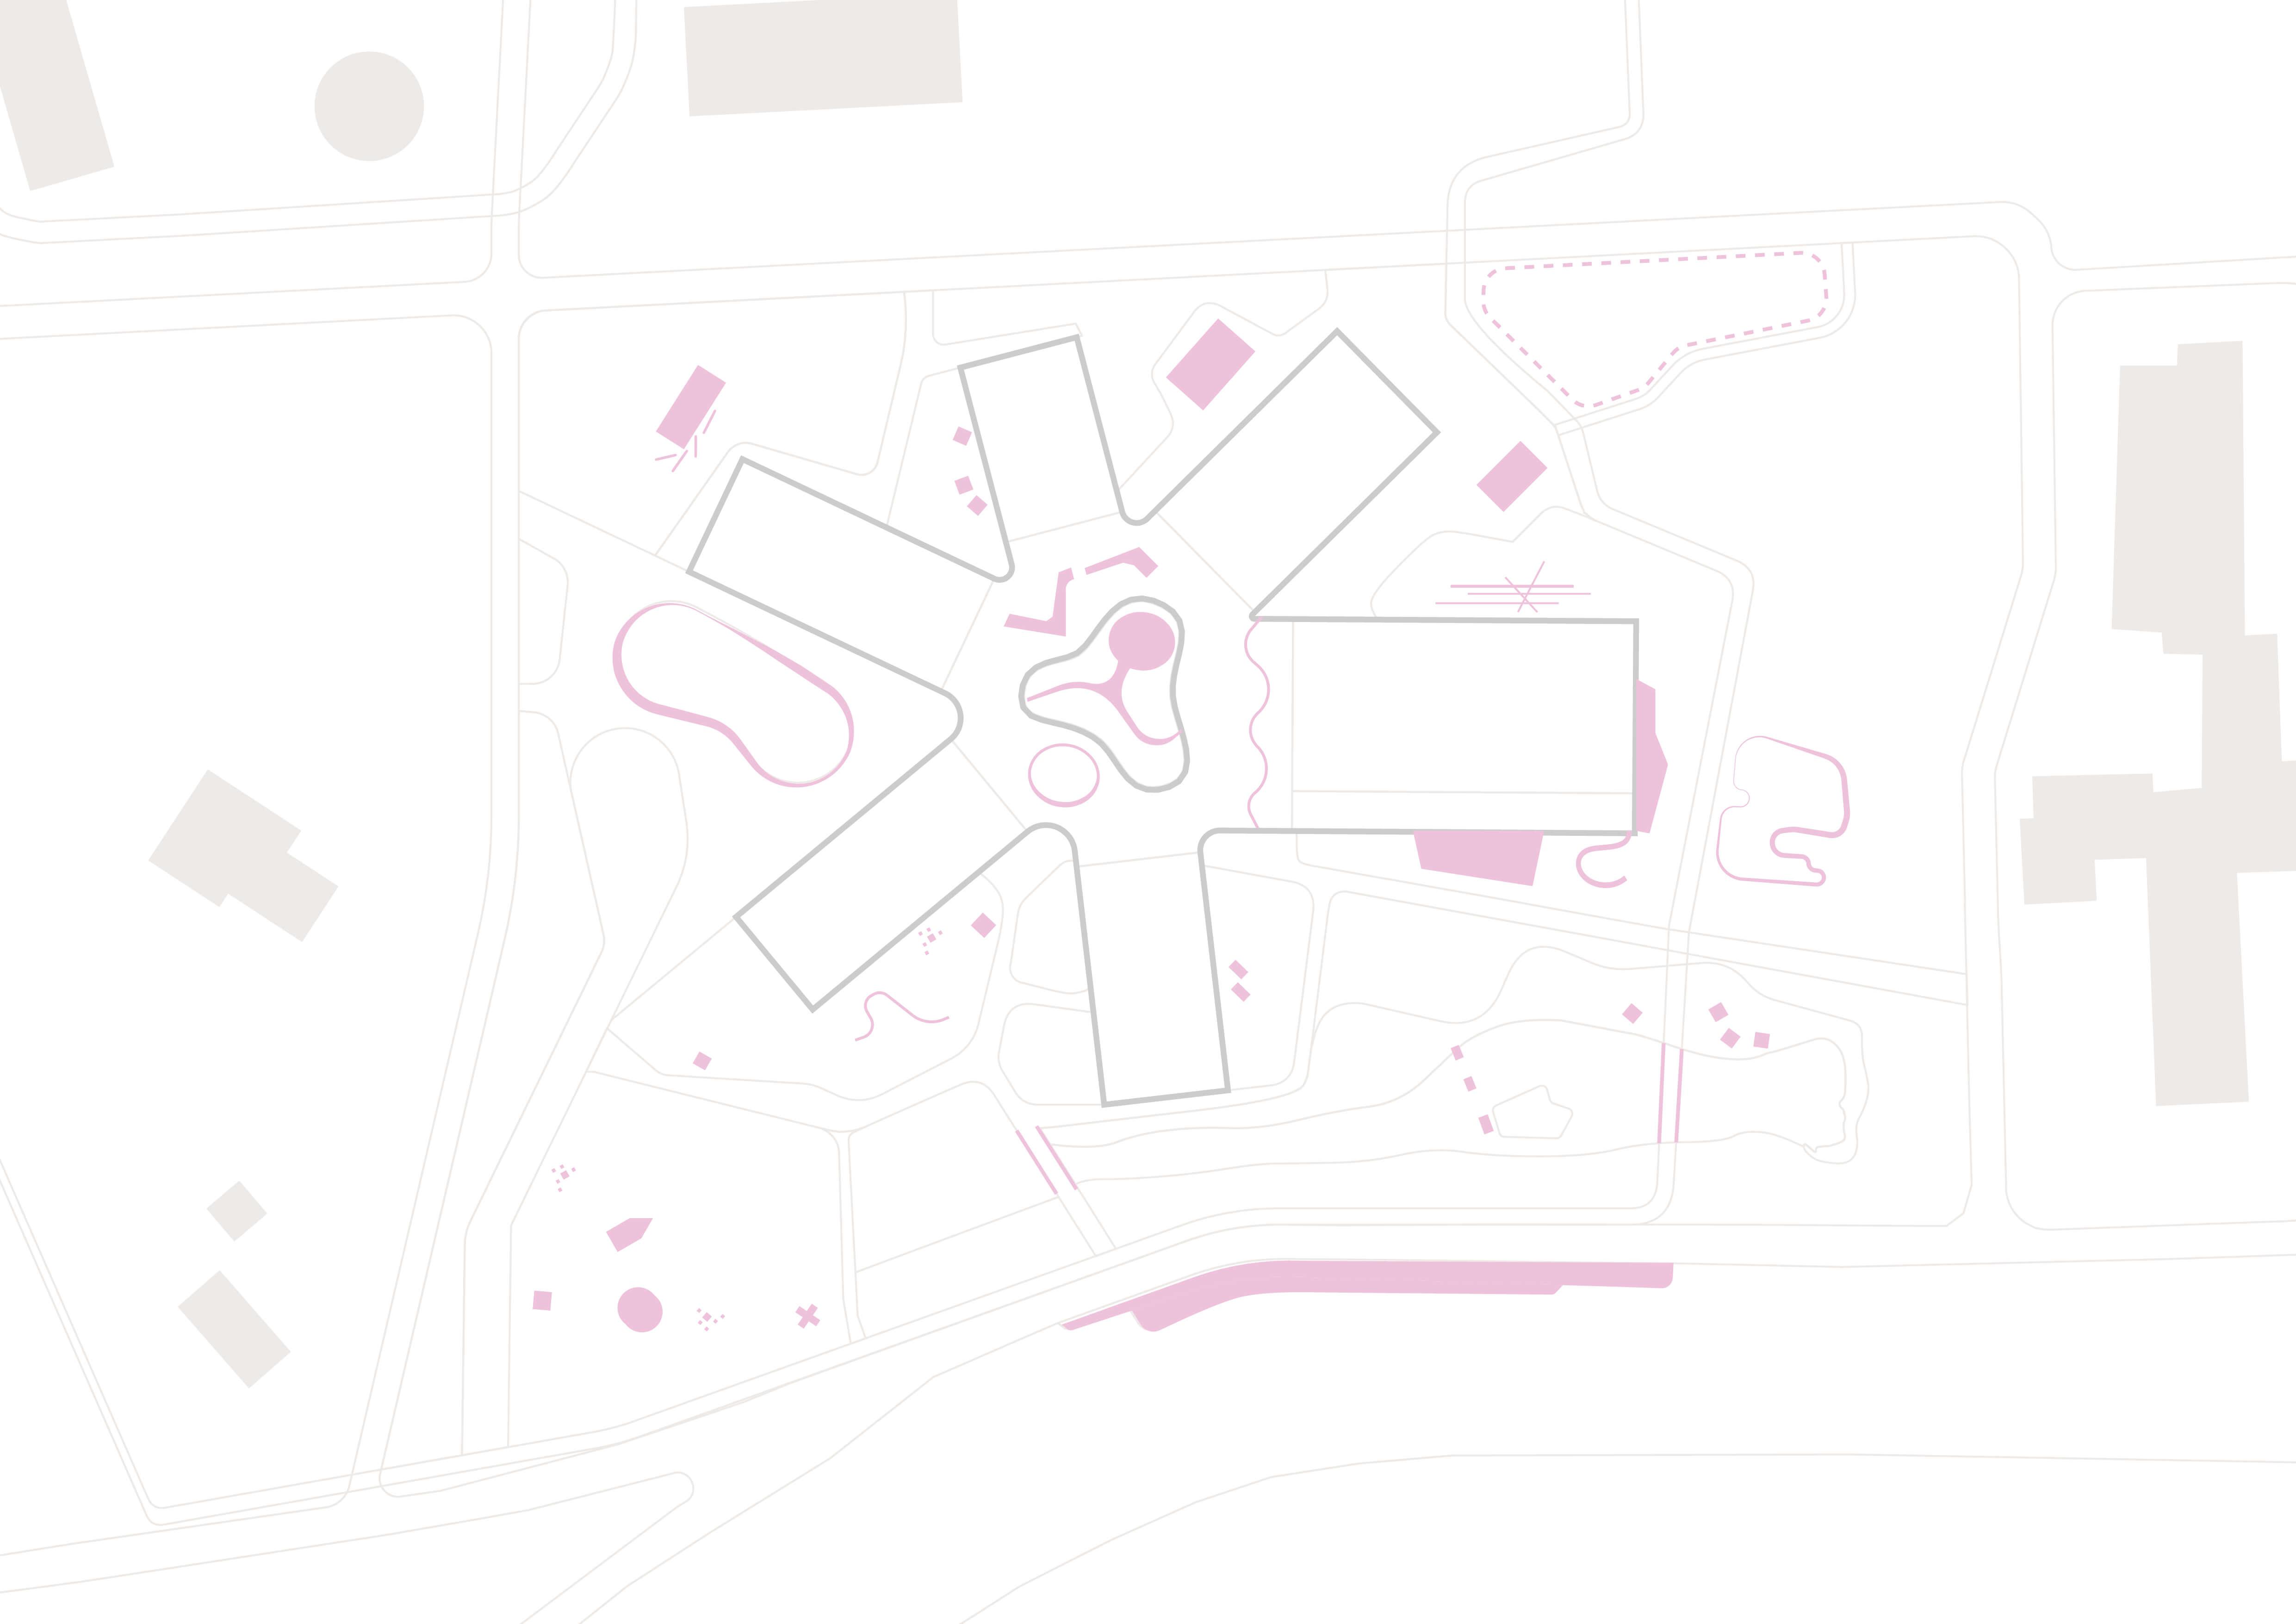 felixx-eemsdelta-schemeobjects.jpg